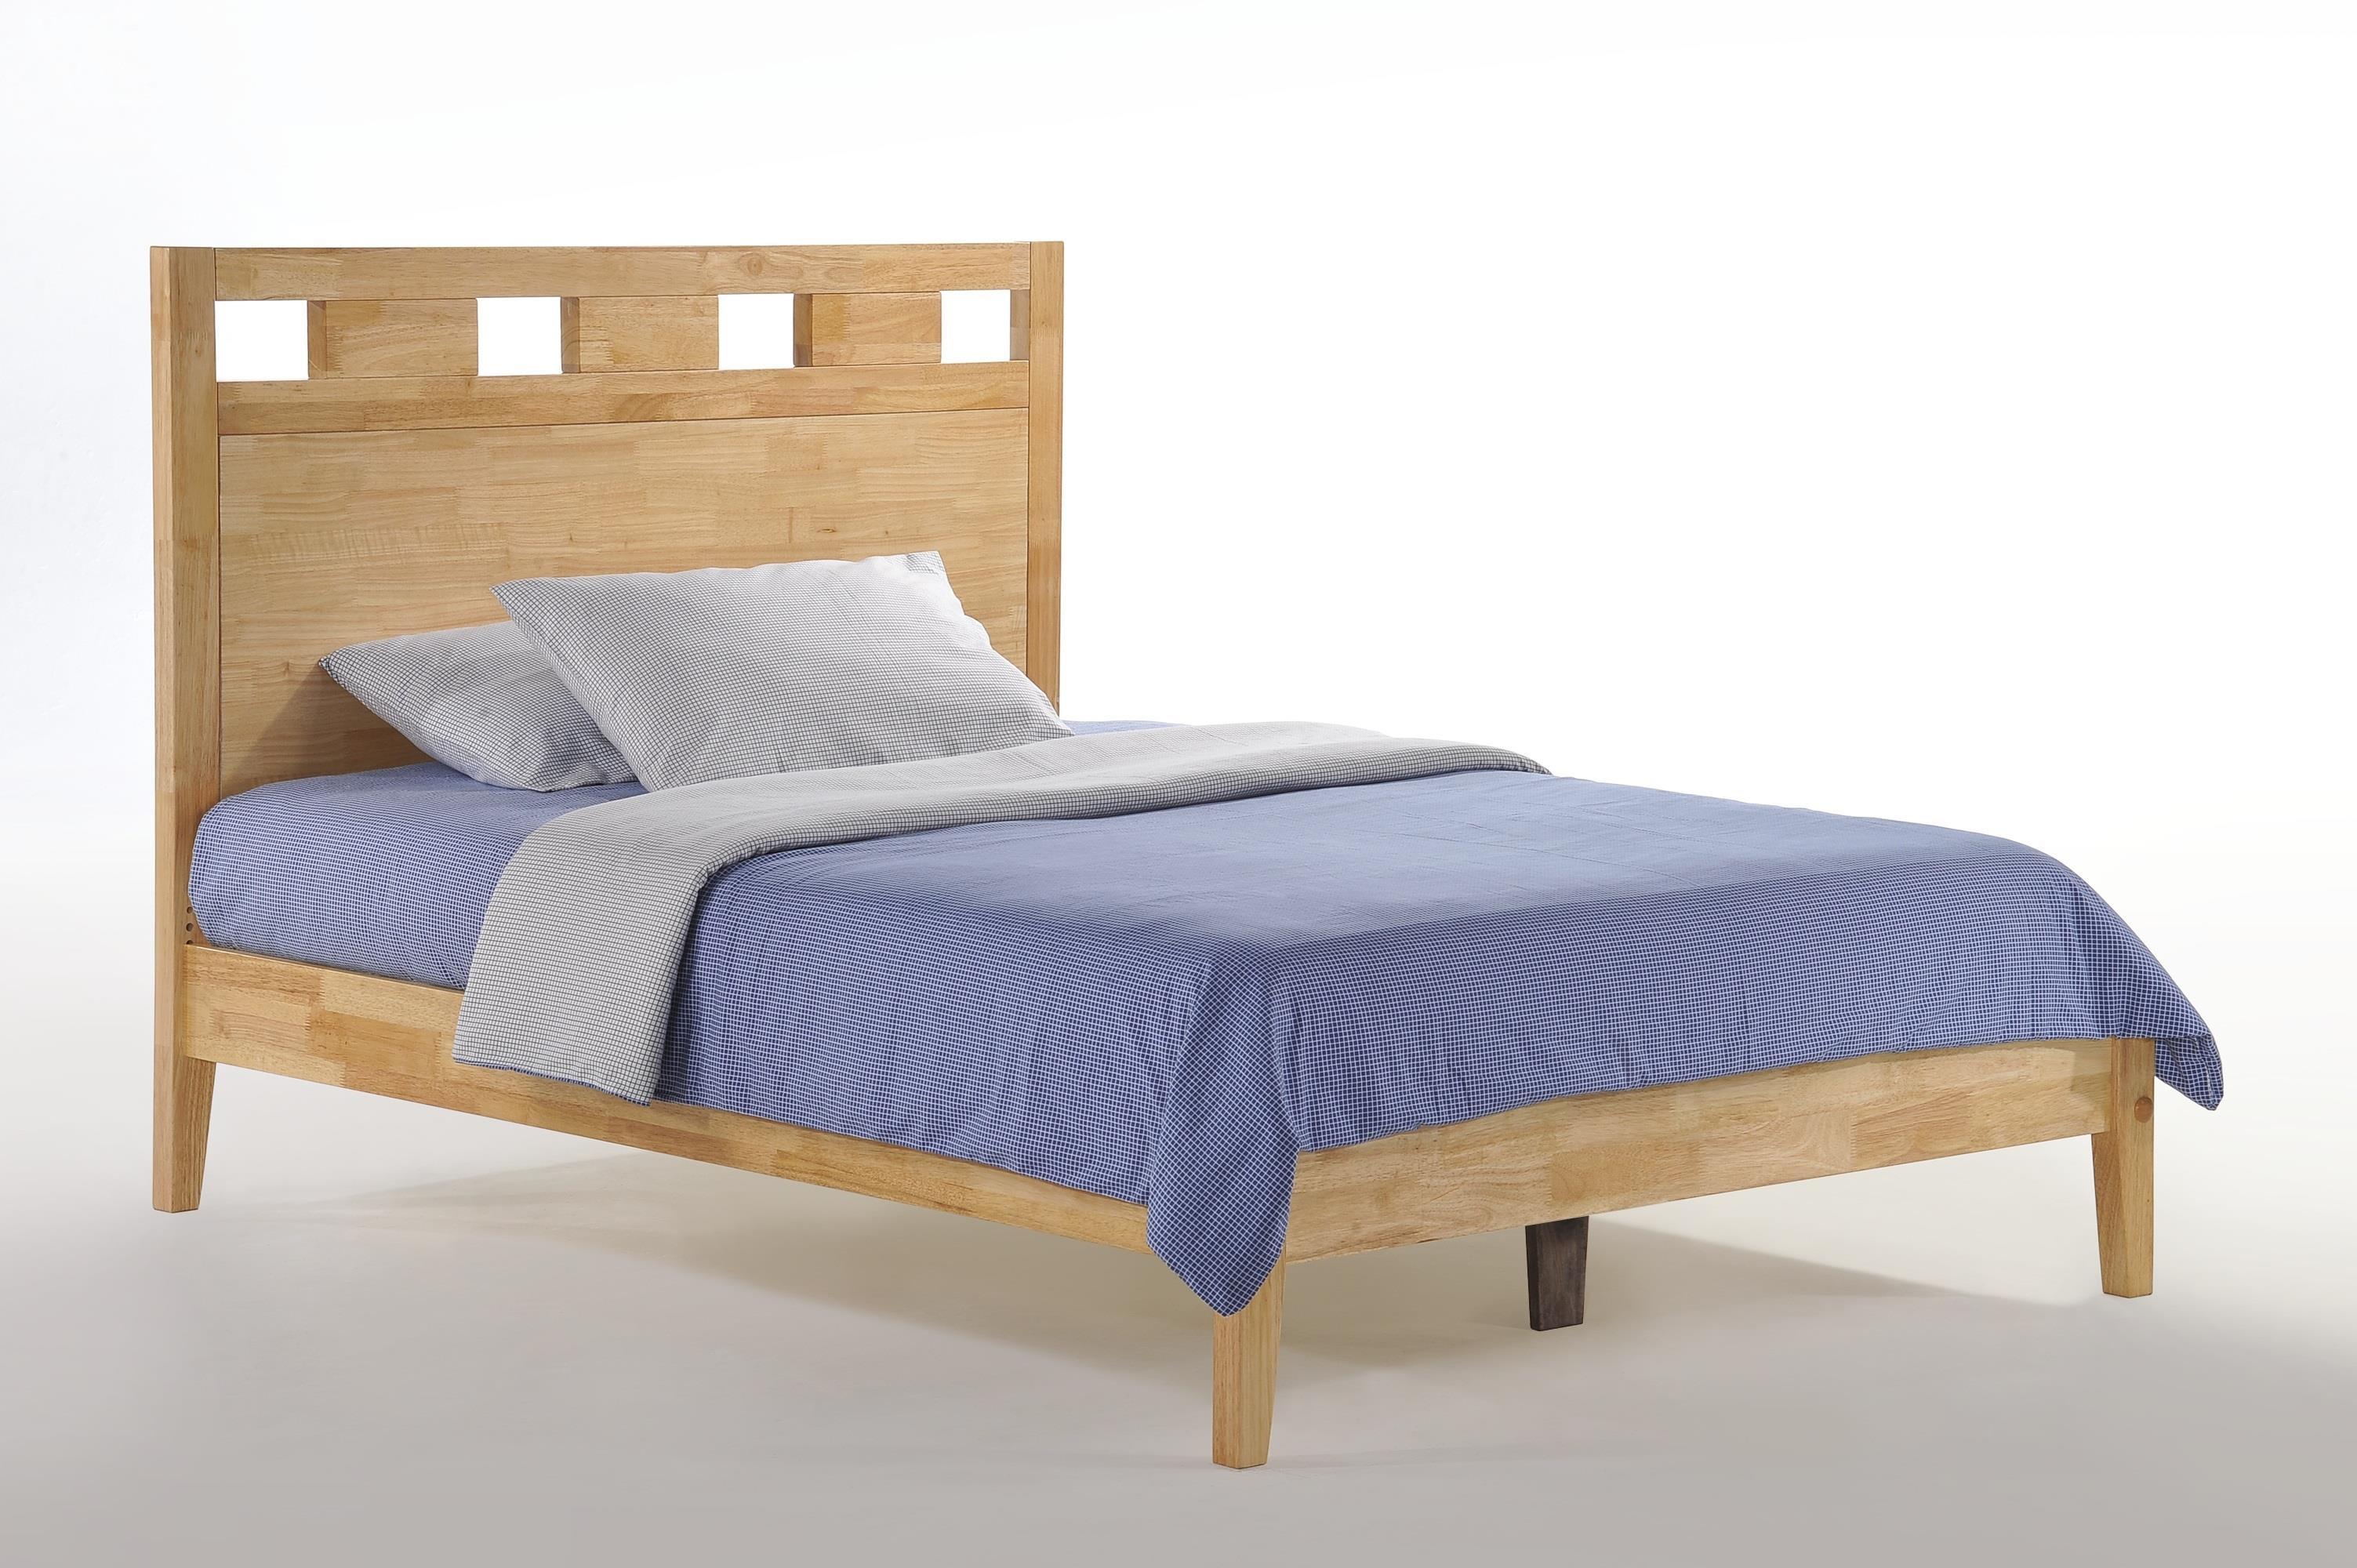 Tamarind King Bed by Pacific Manufacturing at SlumberWorld